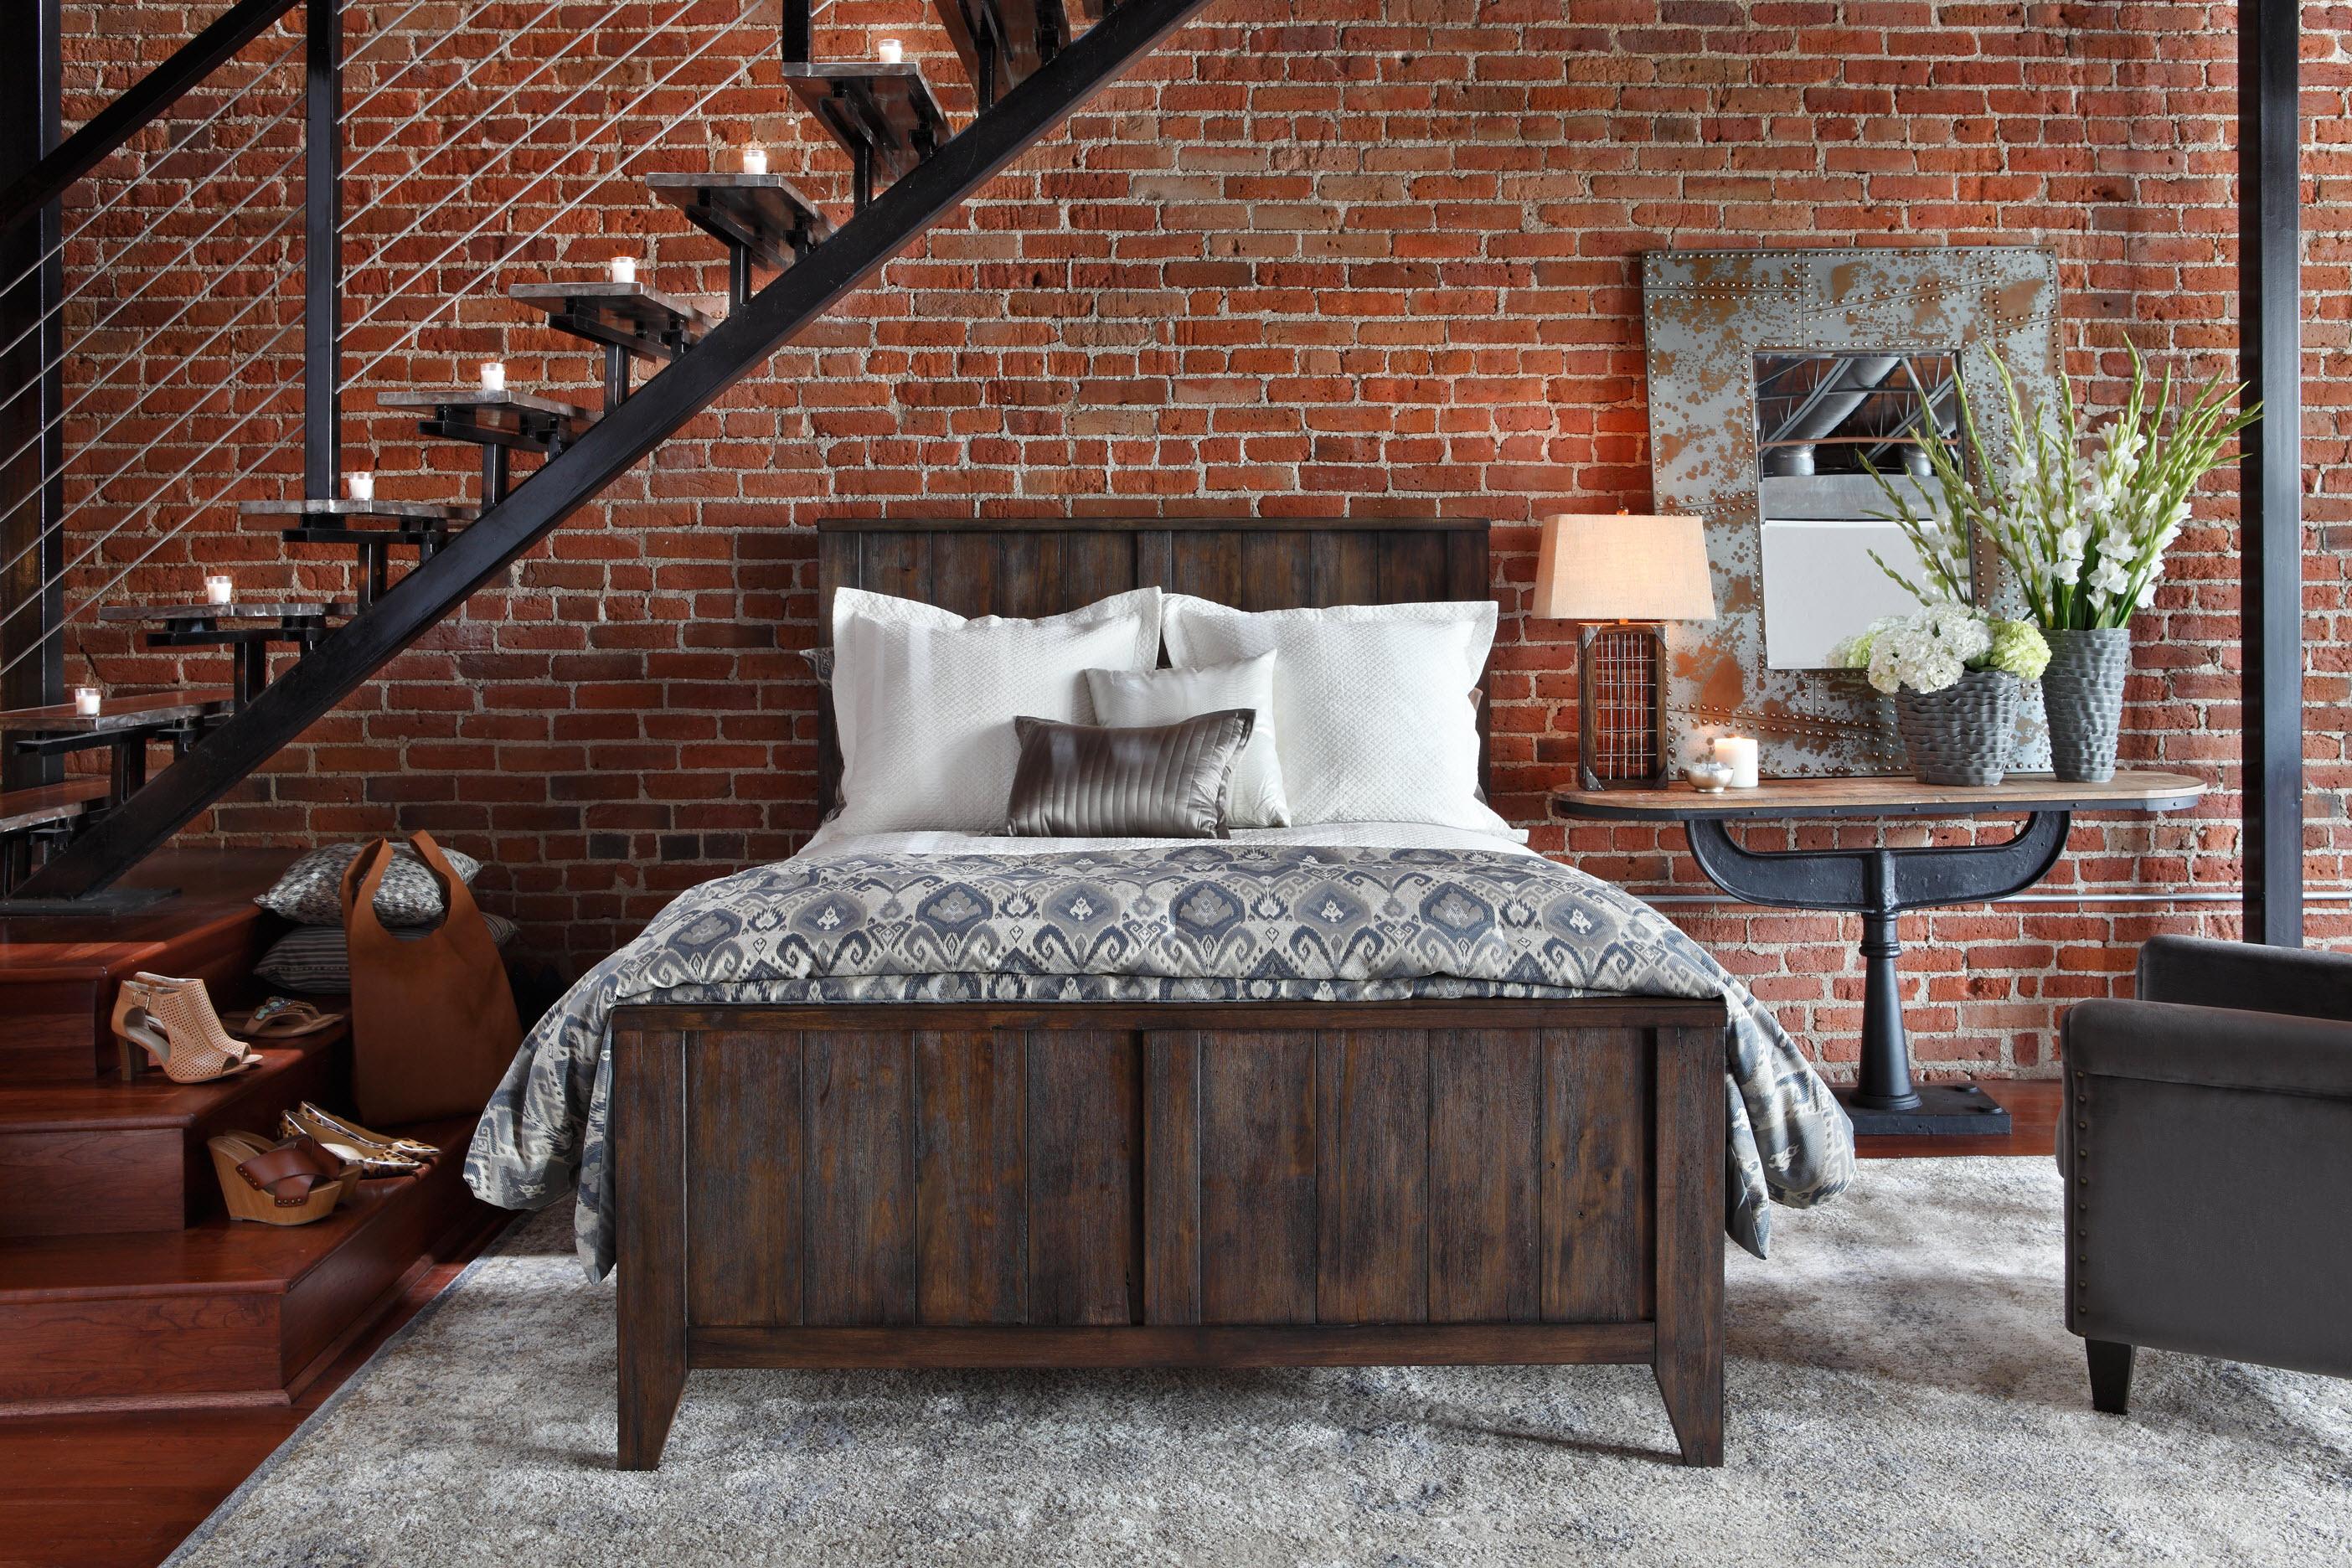 Furniture Row Amarillo Tx Www Furniturerow Com 806 353 3100